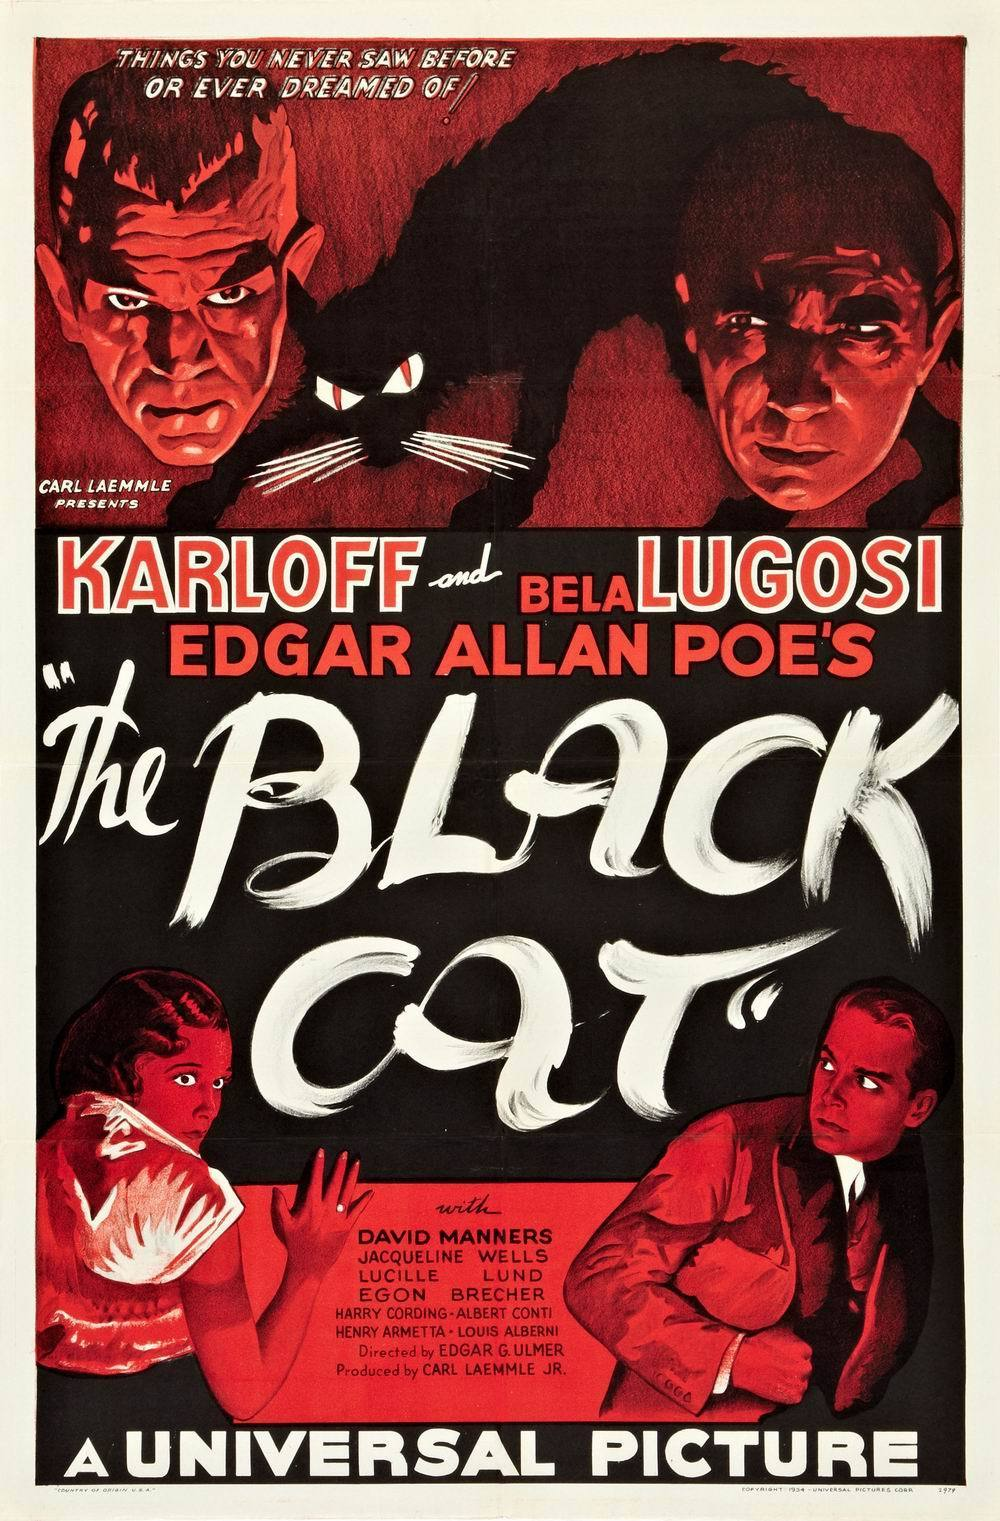 the-black-cat-1934-1kite44the-black-cat-1934-1the-black-cat-1934-15the-black-cat-1934-16the-black-cat-1934-3